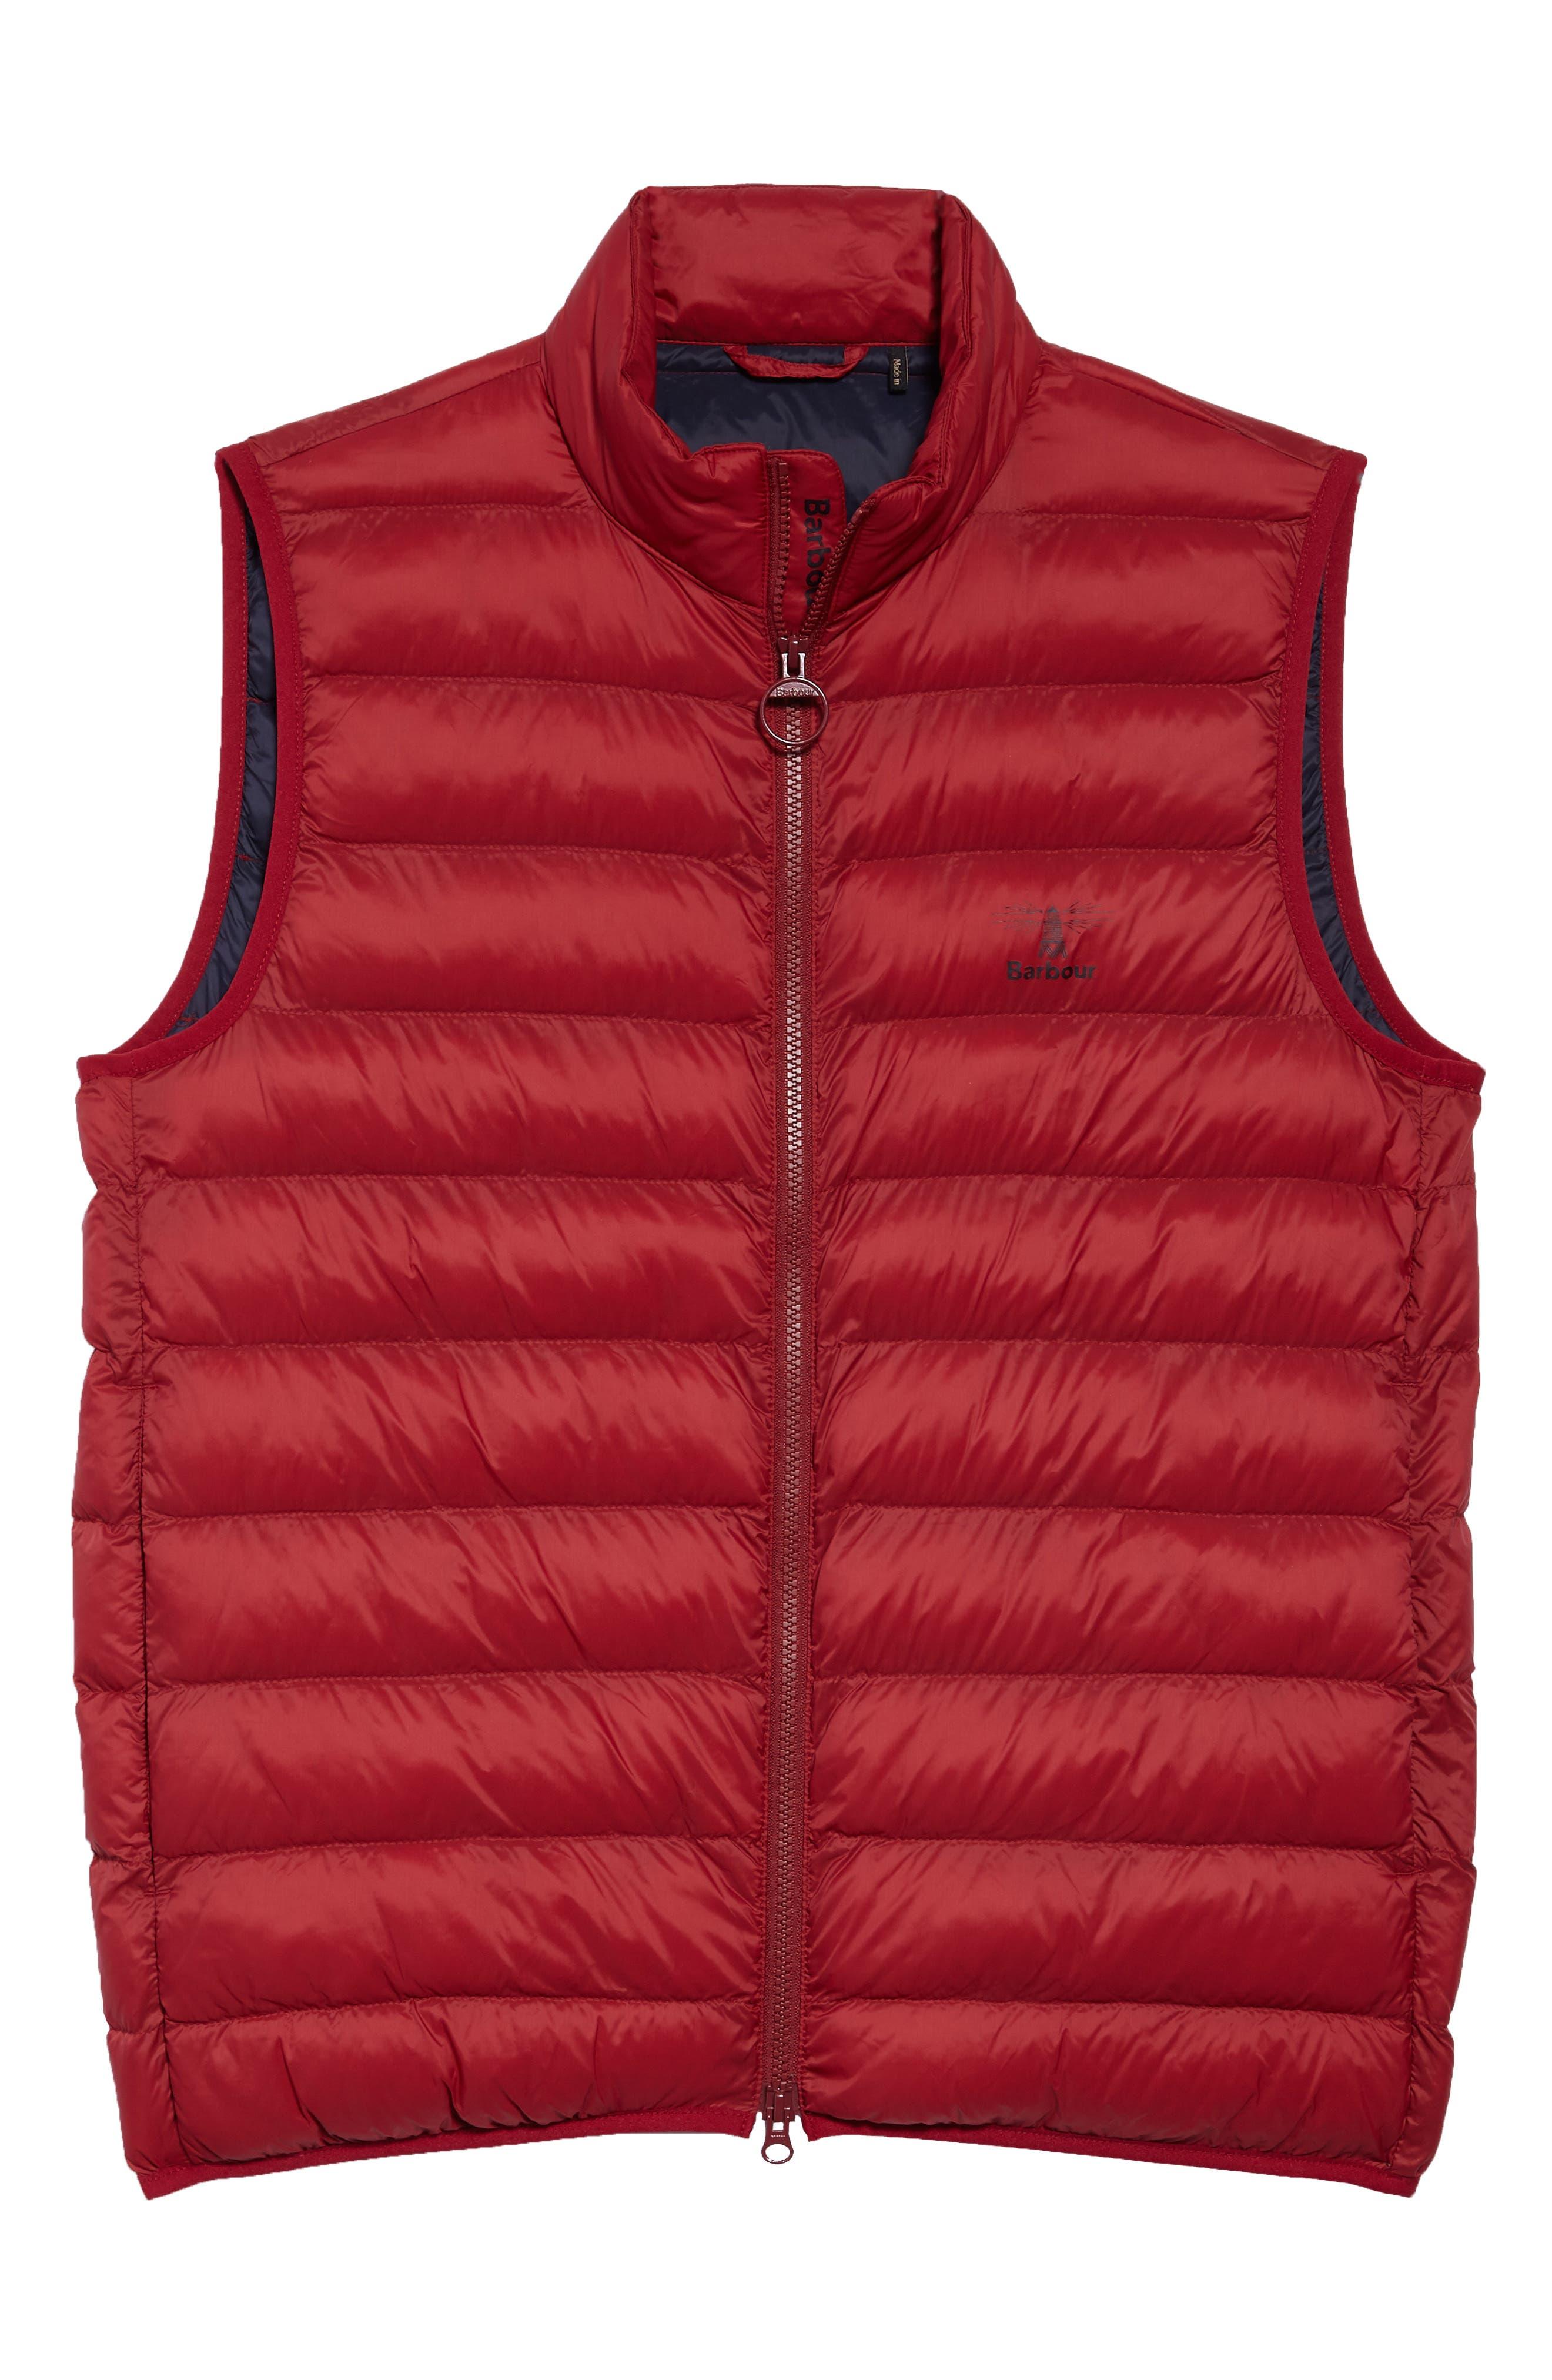 Askham Quilted Vest,                             Alternate thumbnail 5, color,                             BIKING RED